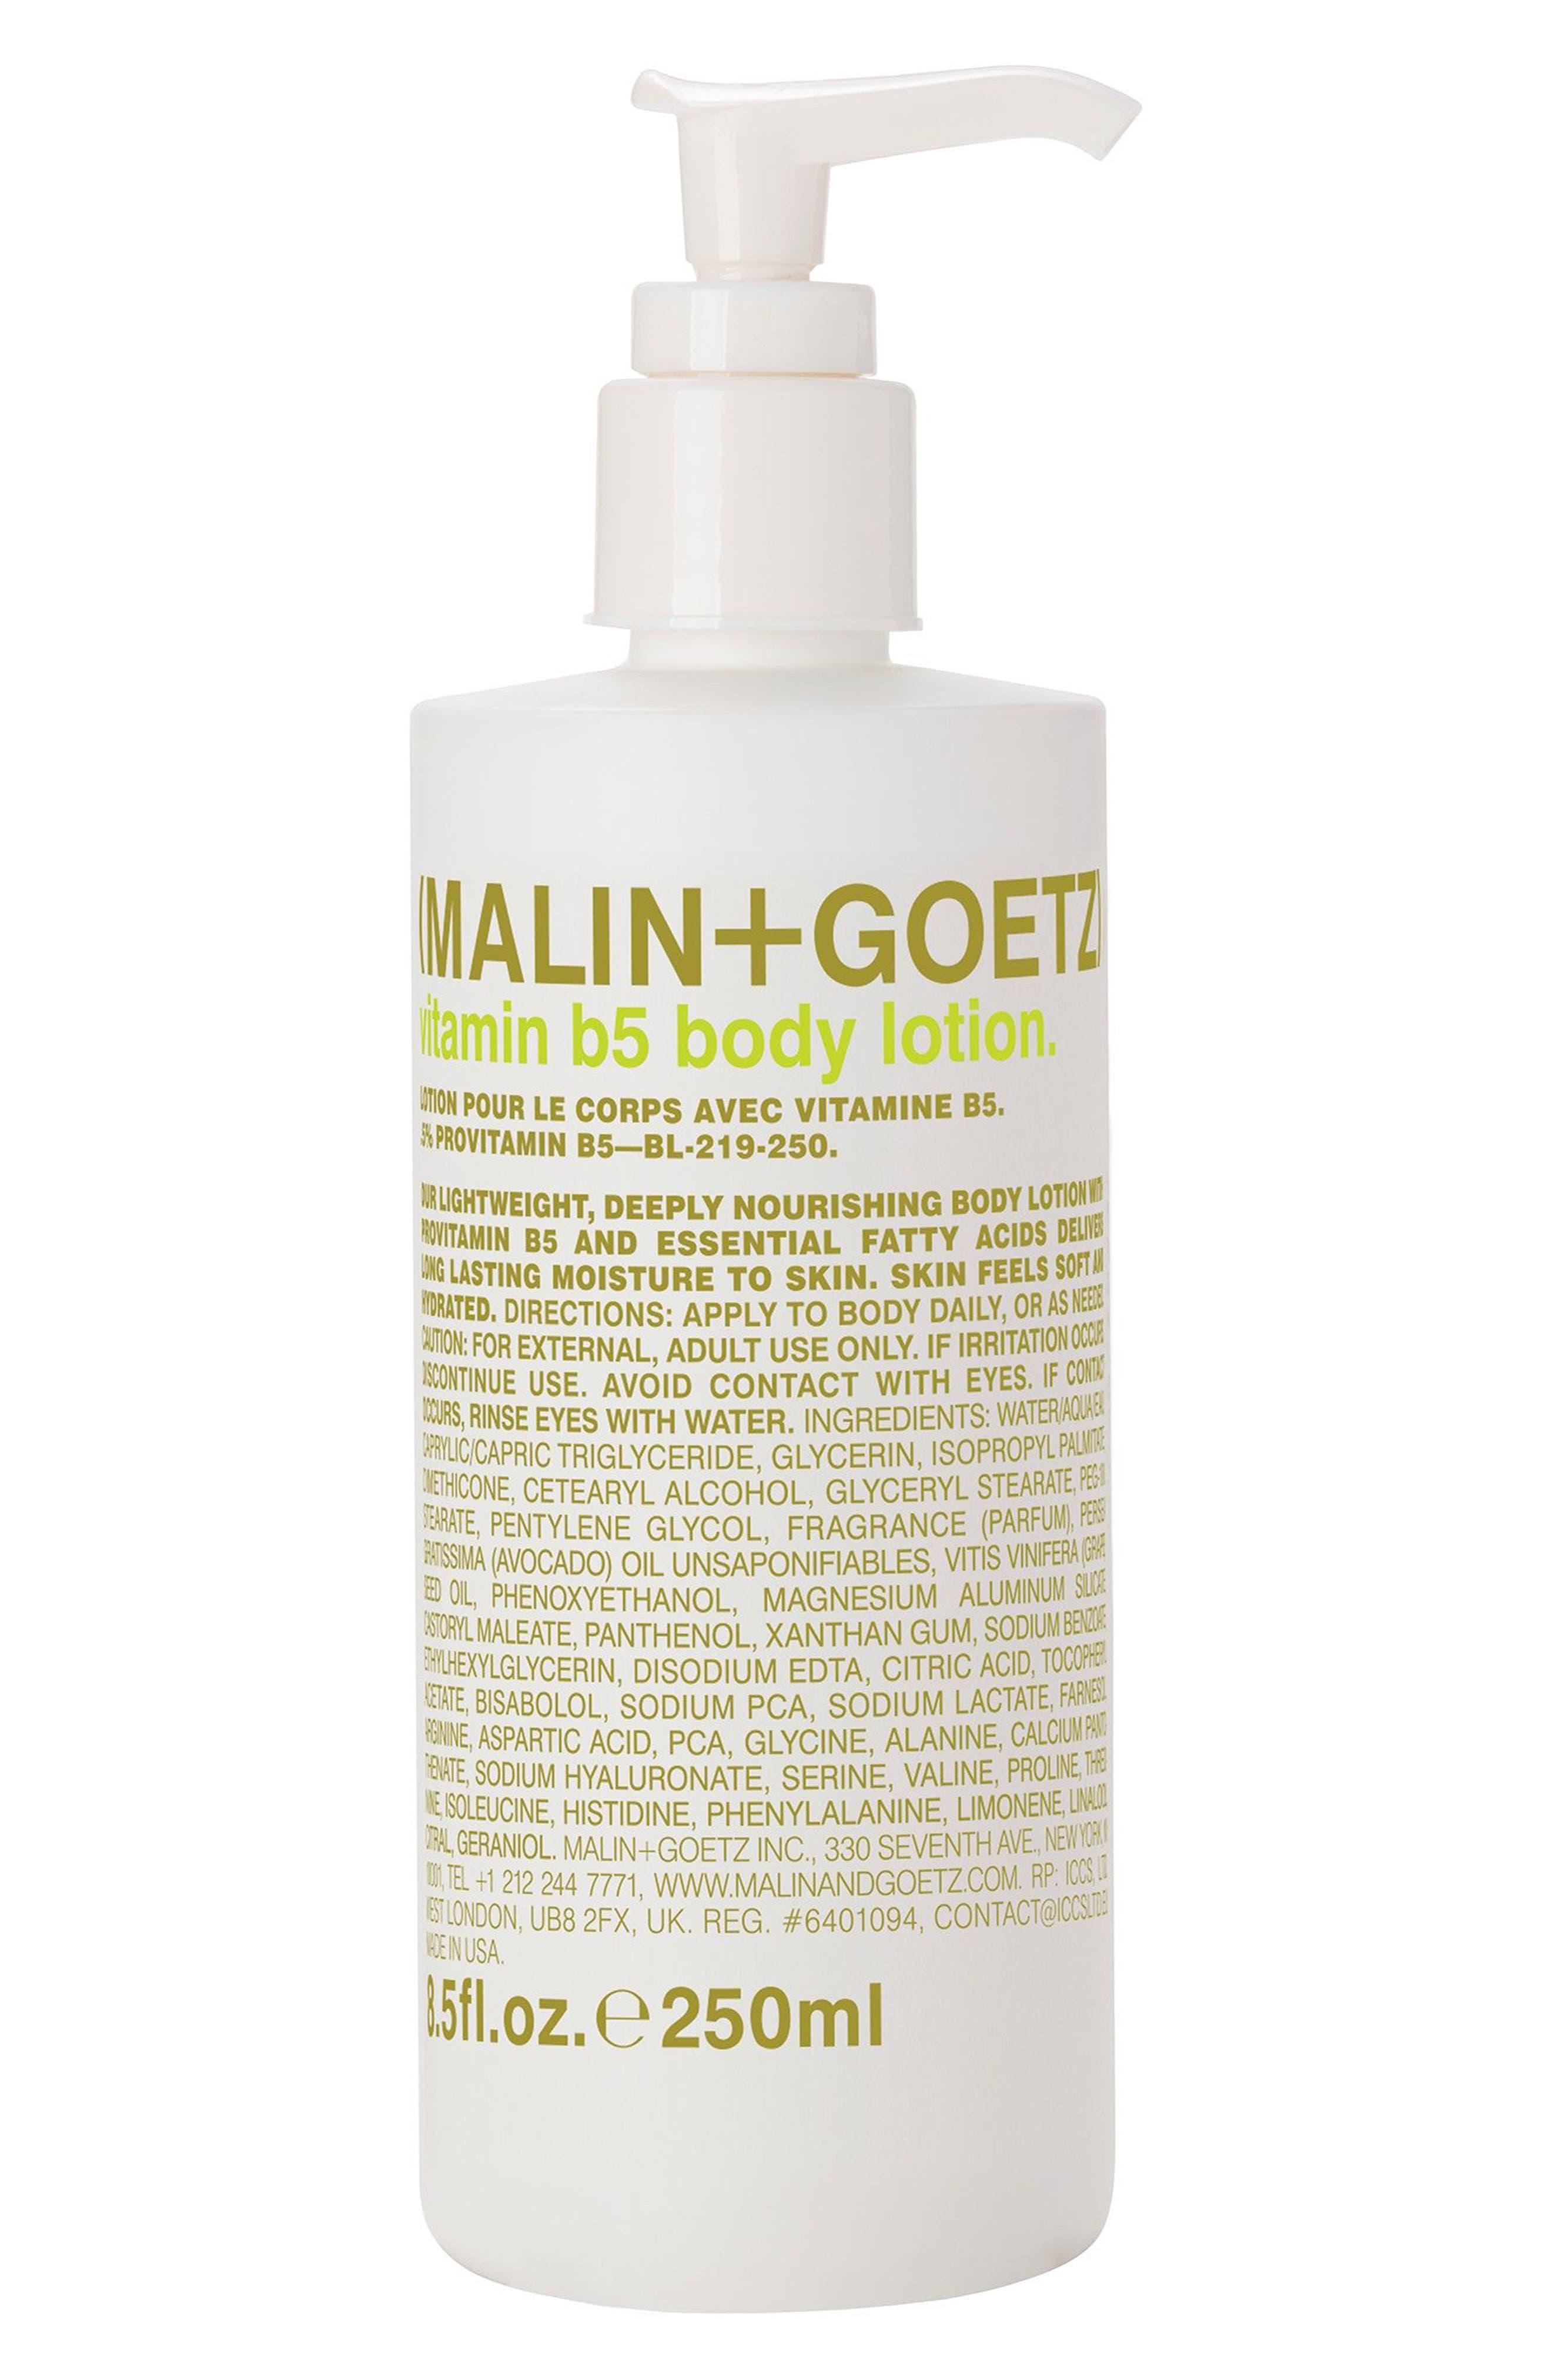 Alternate Image 1 Selected - MALIN+GOETZ Vitamin B5 Body Lotion